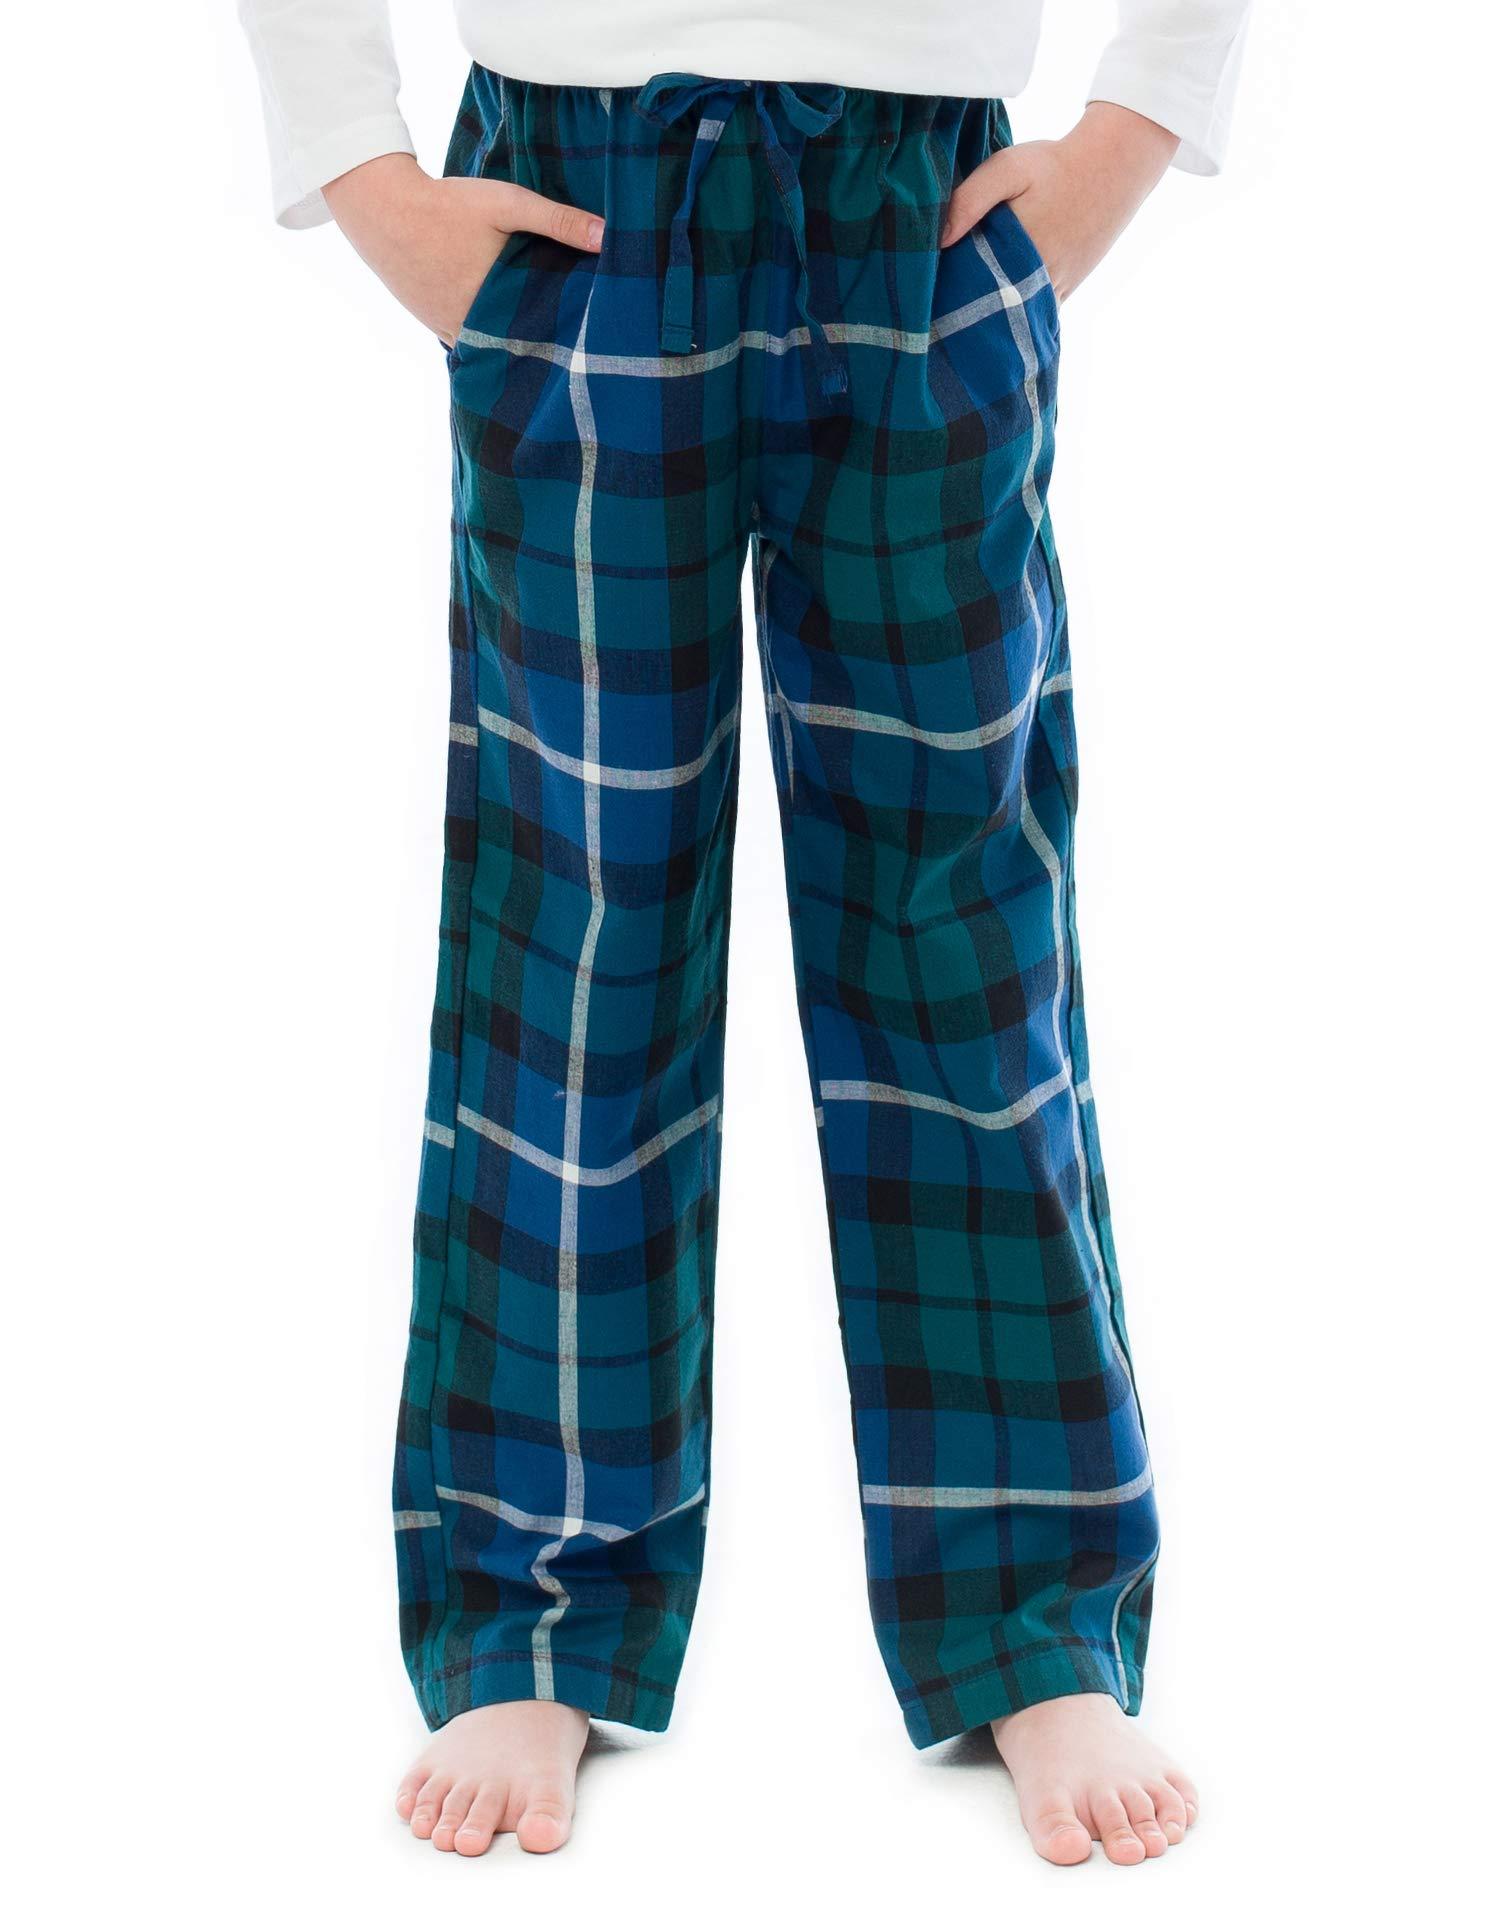 TINFL Kids Boys 100% Cotton Pajama Lounge Pants